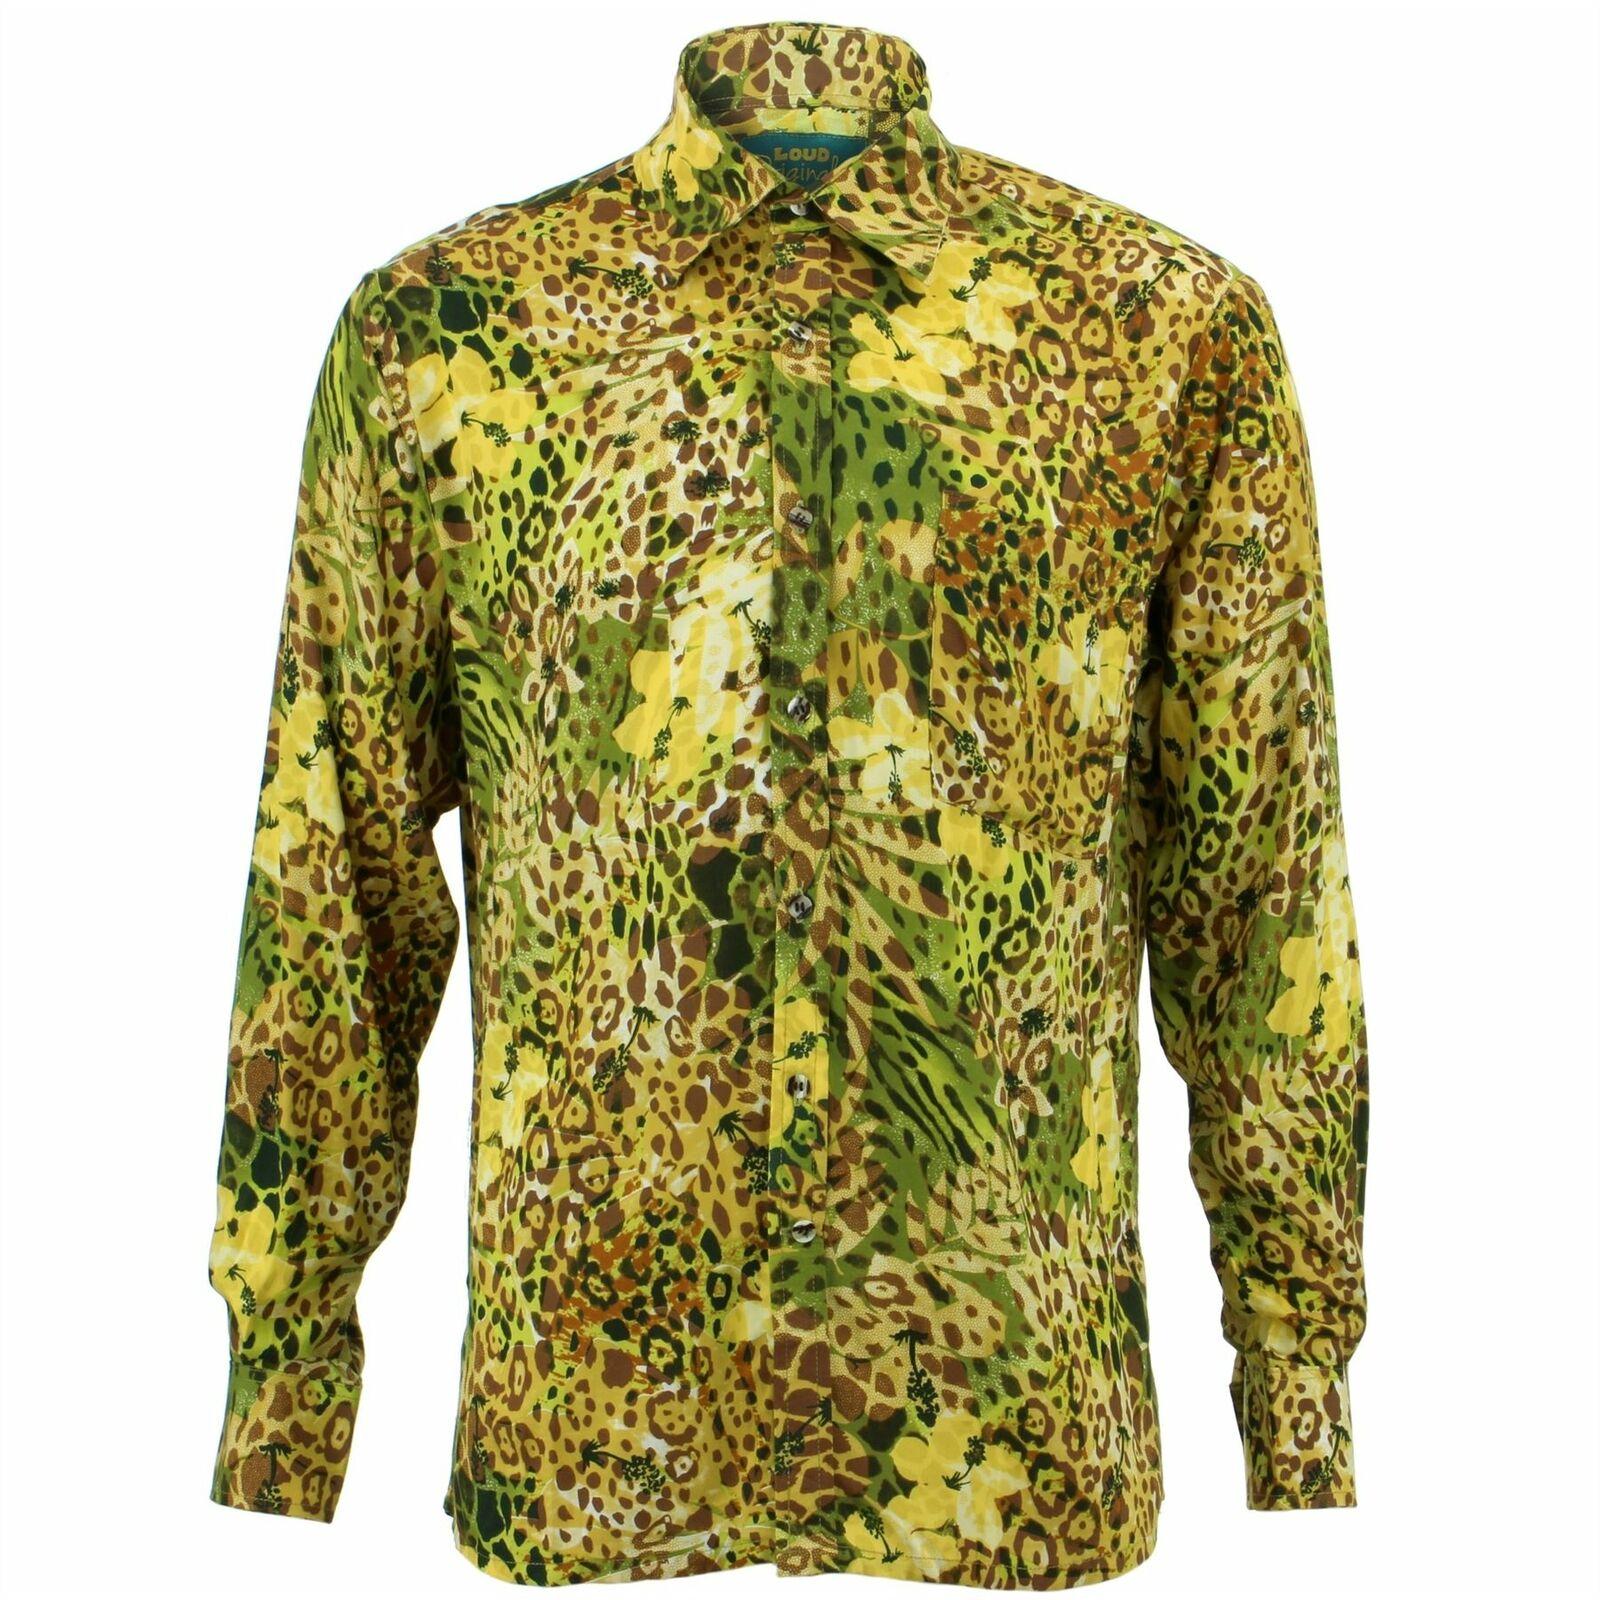 Mens Shirt Loud Originals REGULAR FIT Animal Green Retro Psychedelic Fancy